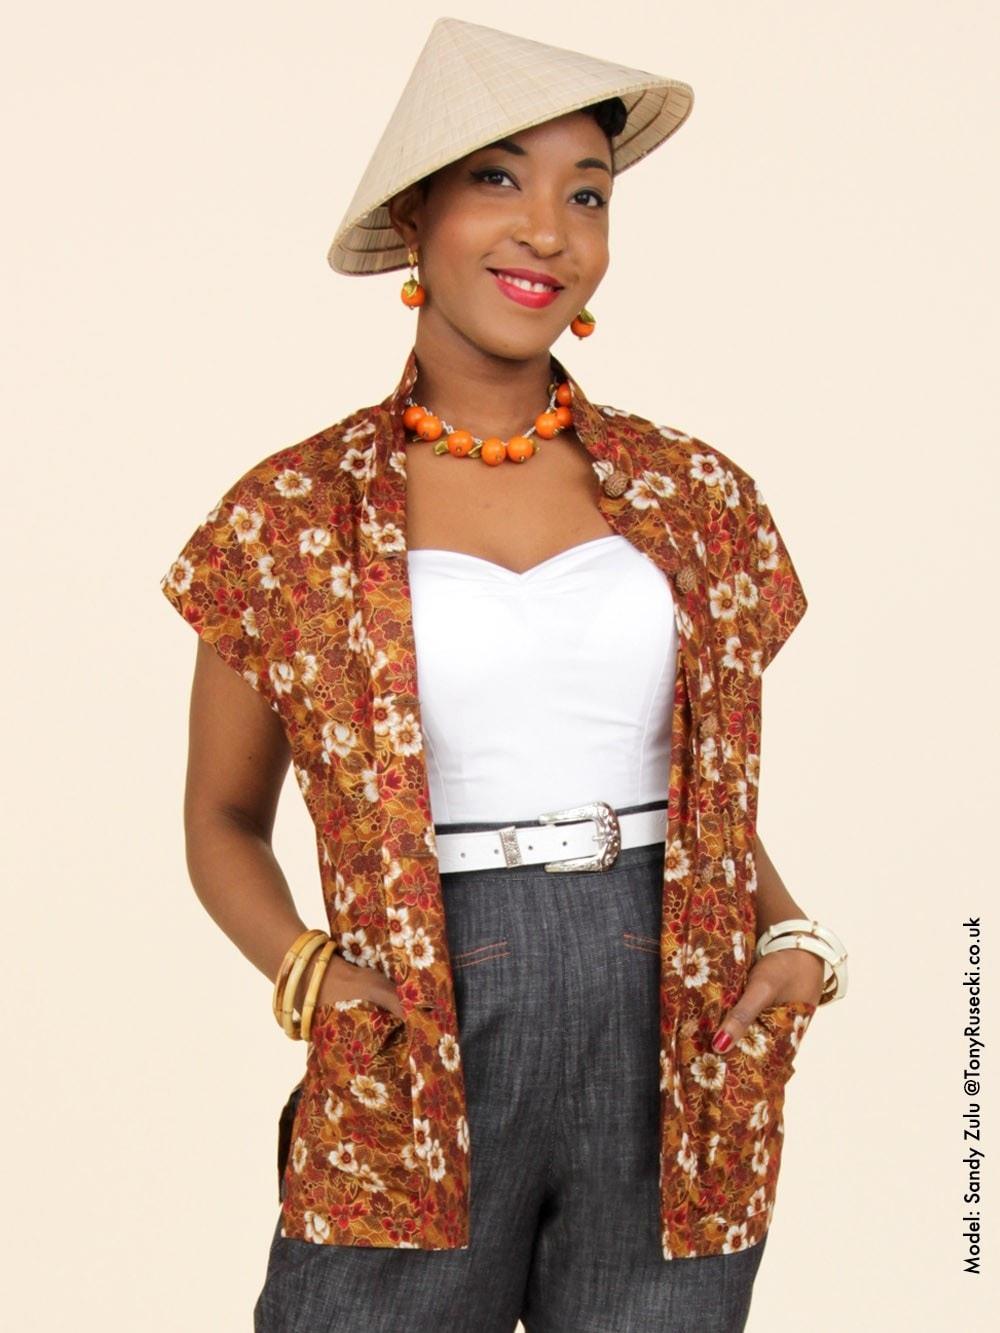 1940s-1950s cotton sun top